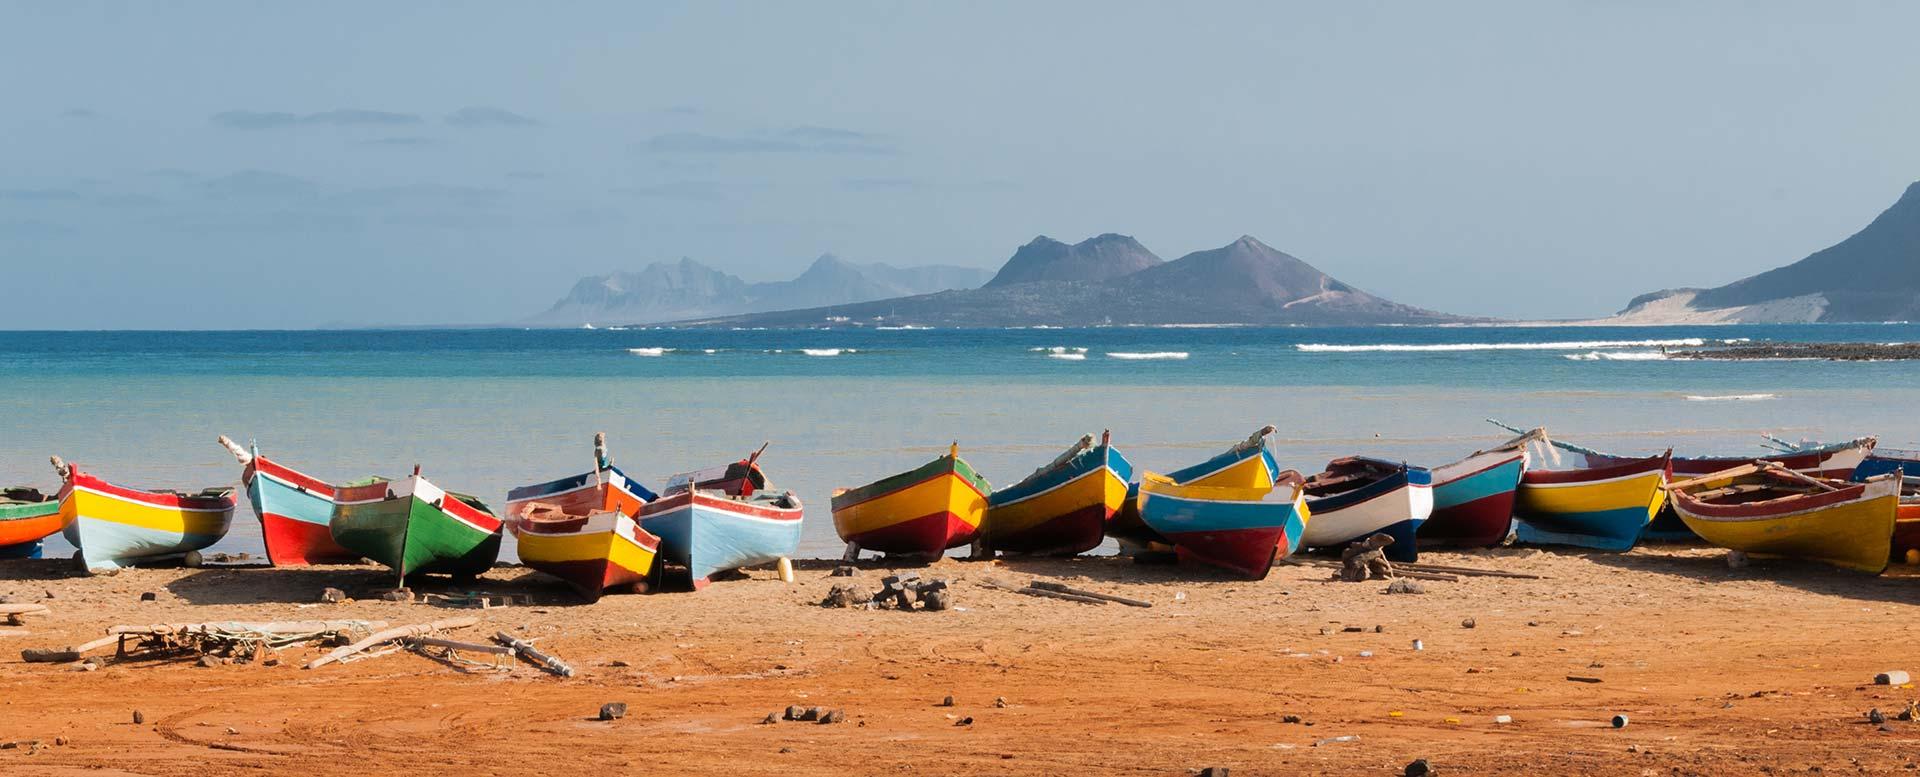 Flitterwochen-Ziel Kap Verde